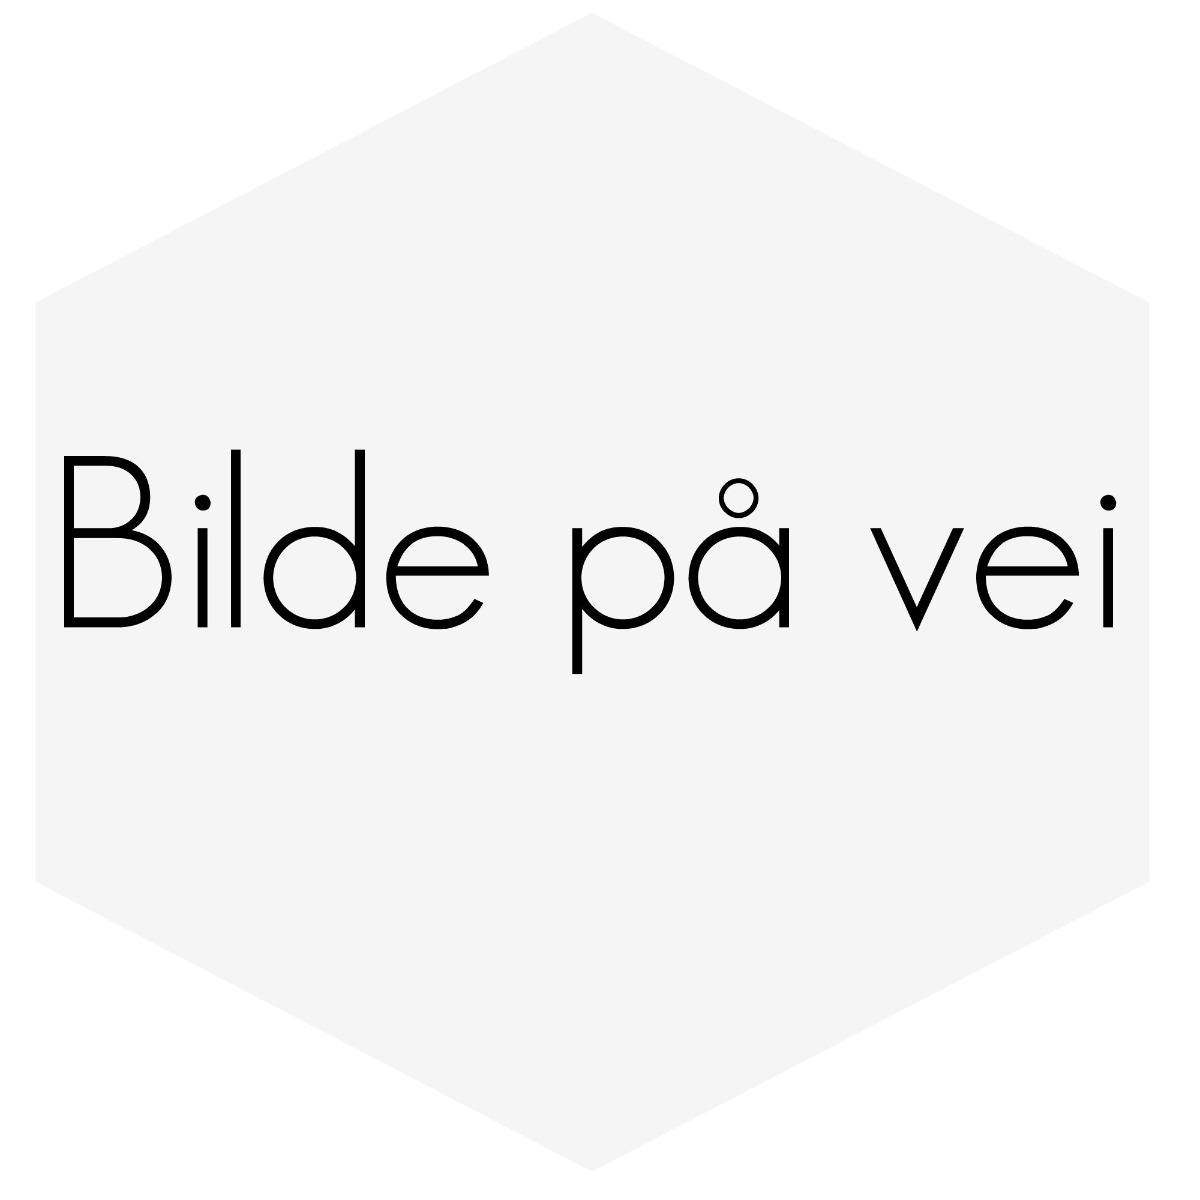 "SILIKONSLANGE RØD REDUSERING 2,5-3"" (63-76MM)"